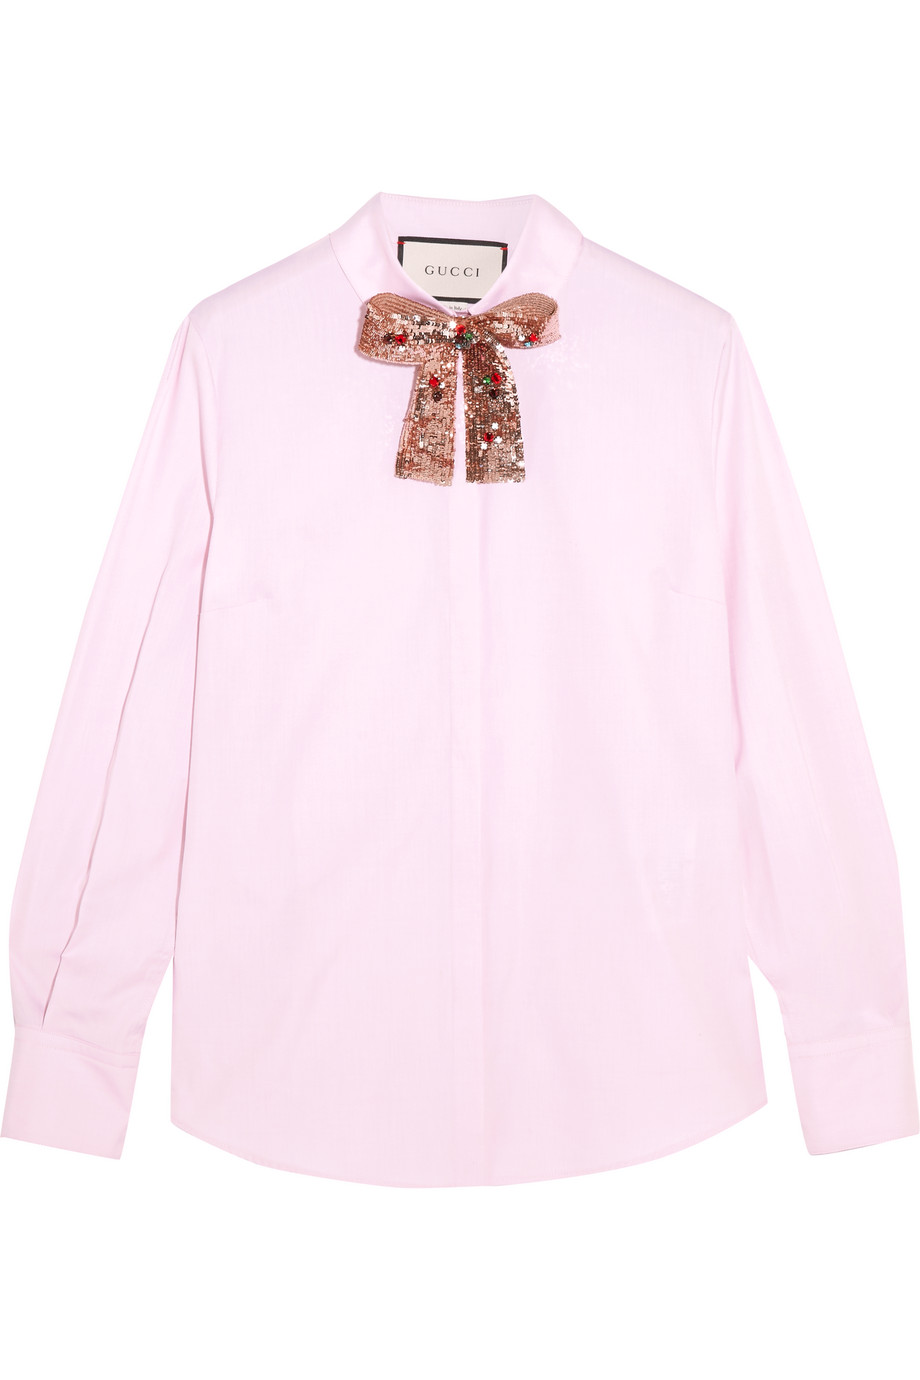 Gucci Embellished Cotton-Poplin Shirt, Pink, Women's, Size: 46